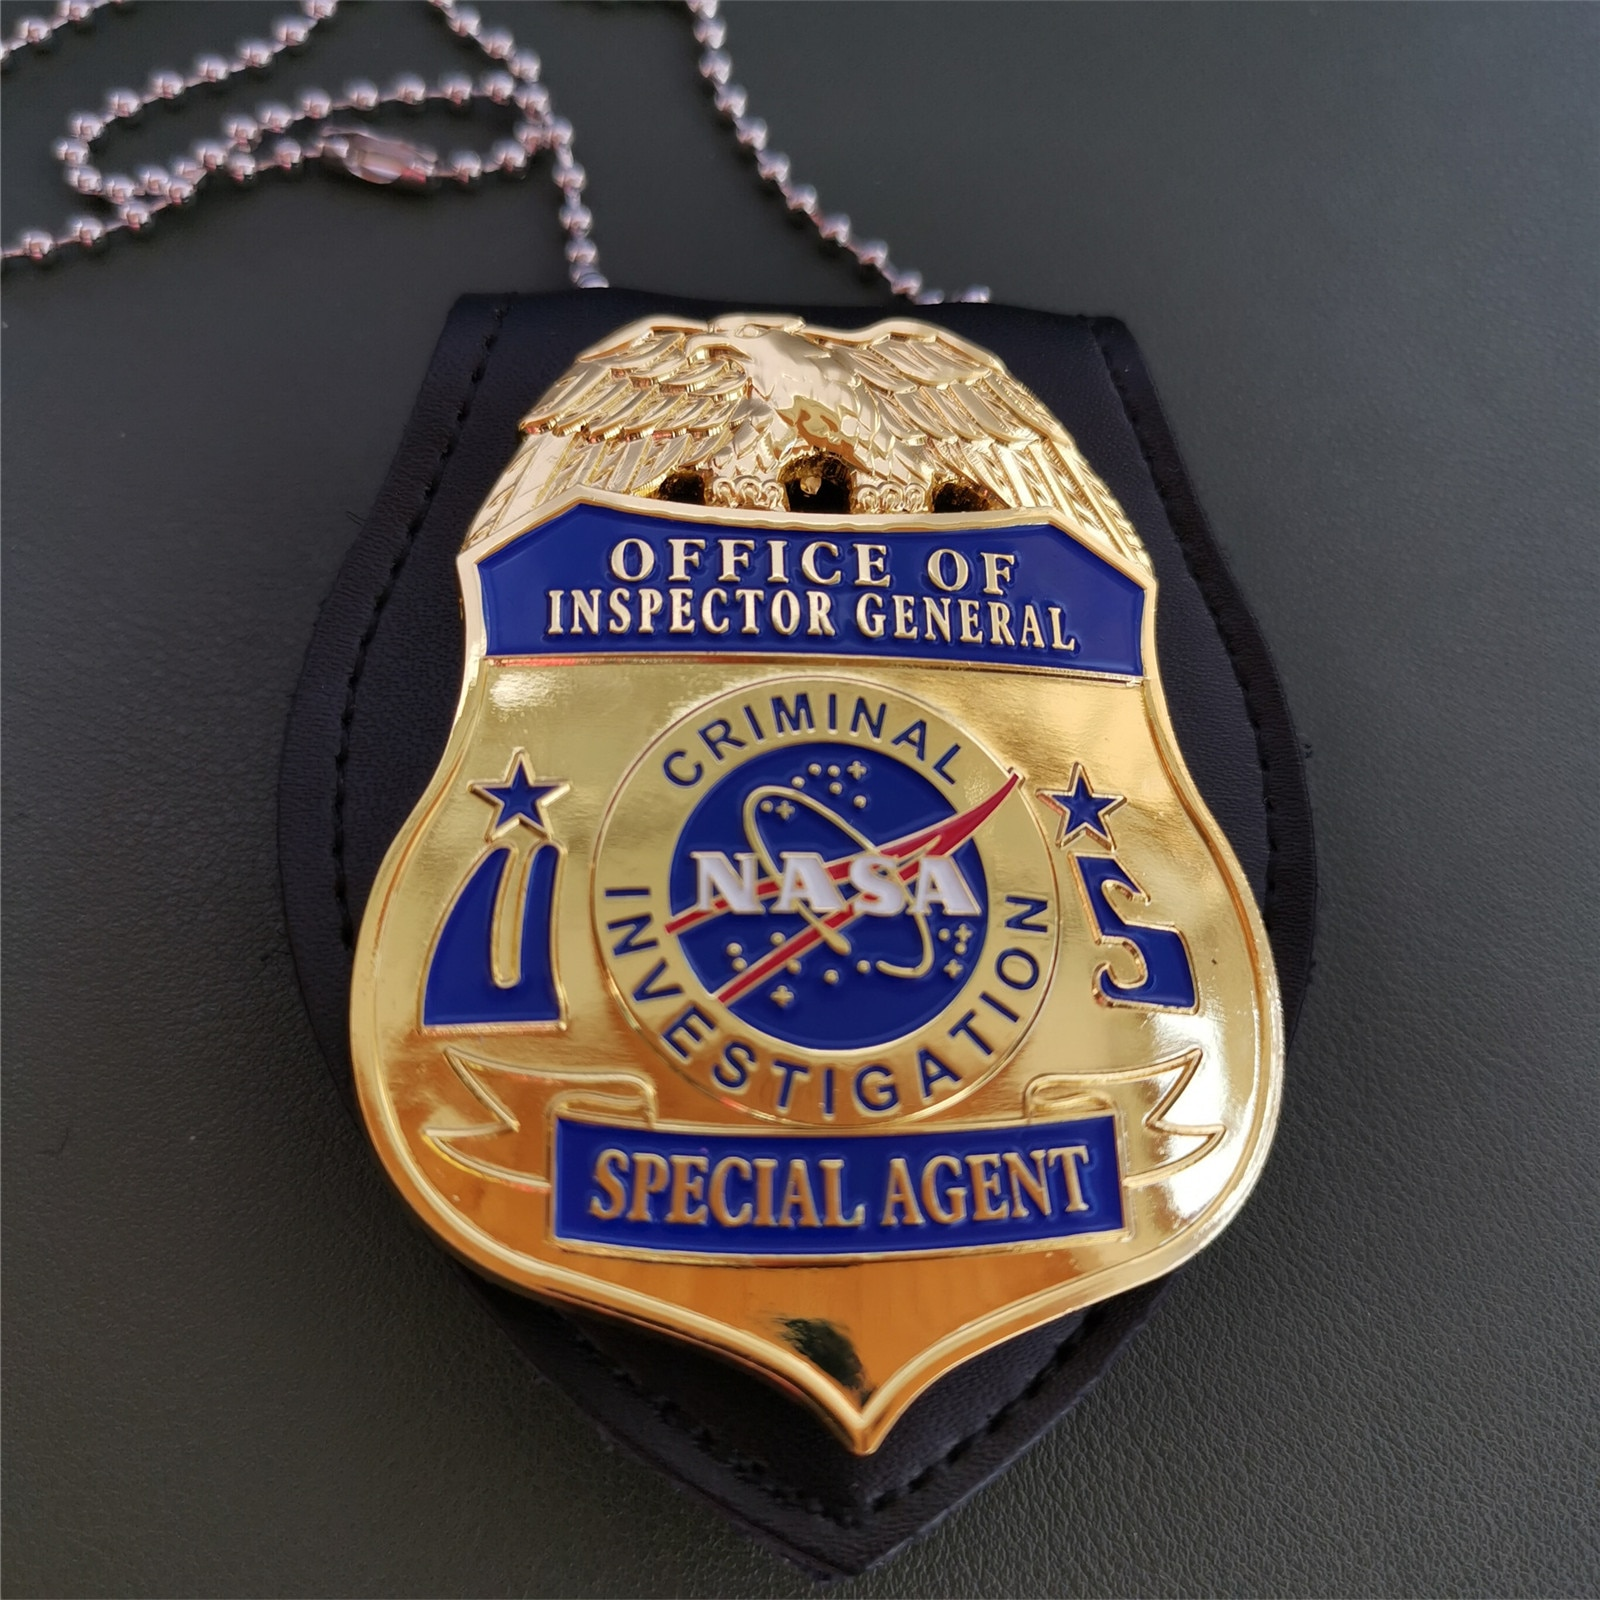 us-national-aeronautics-and-space-administration-agent-badge-1-1